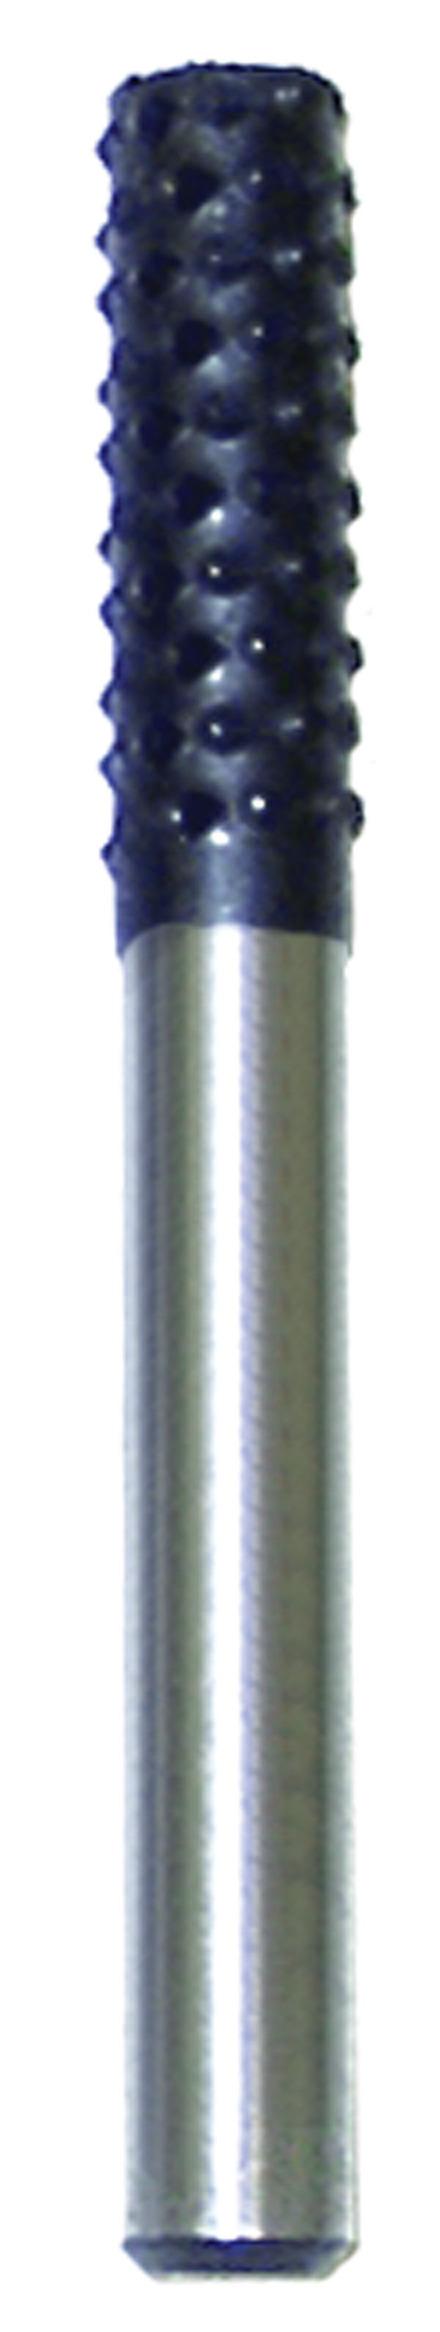 Rotary Wood Rasp made of High Quality Steel – Cylindrical – 1/4″ x 1/4″ mandrel.